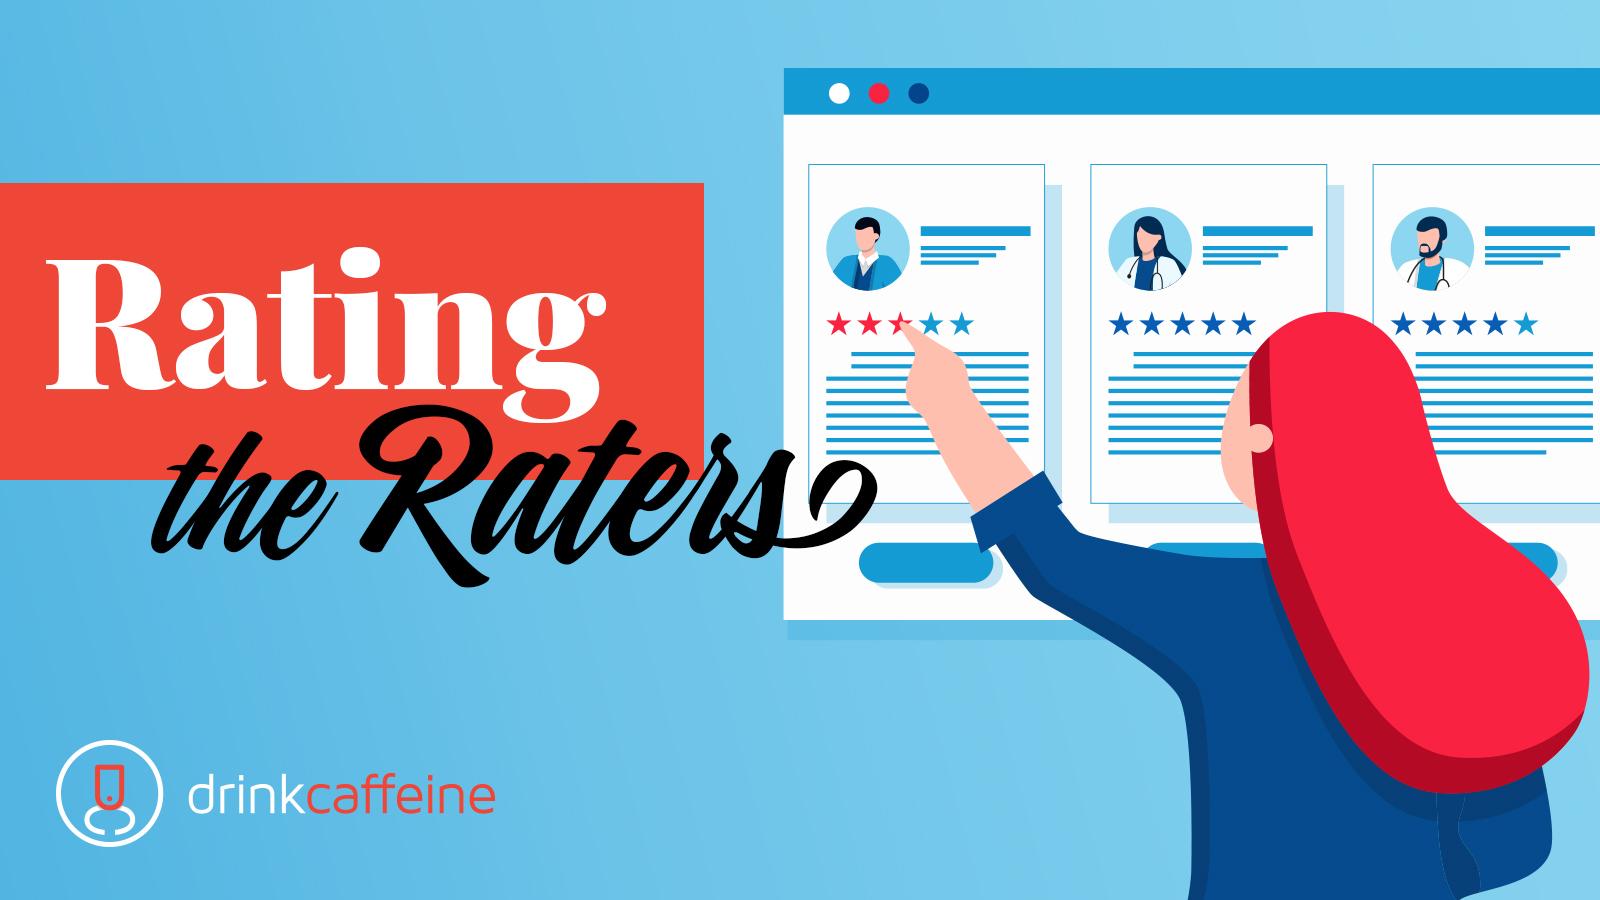 Examining Doctor Rating Websites blog image